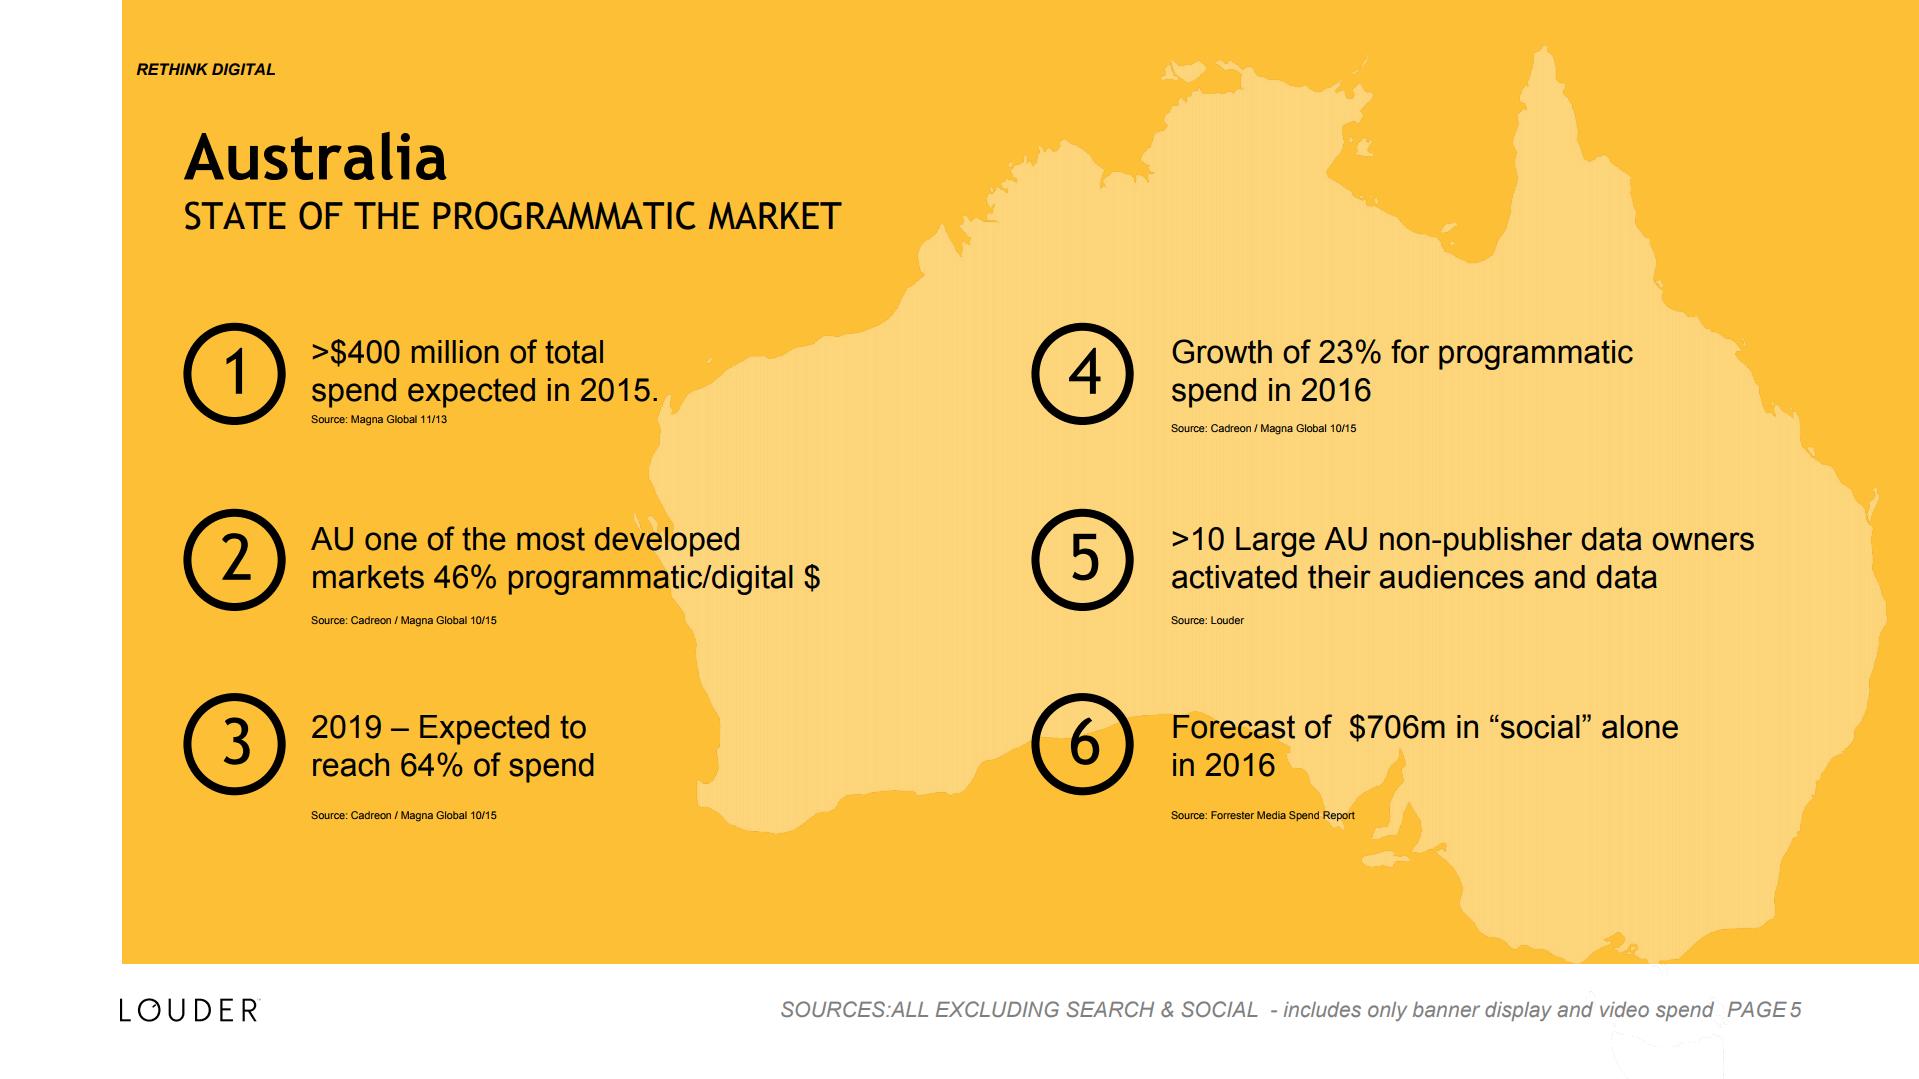 Australia, state of the programmatic market